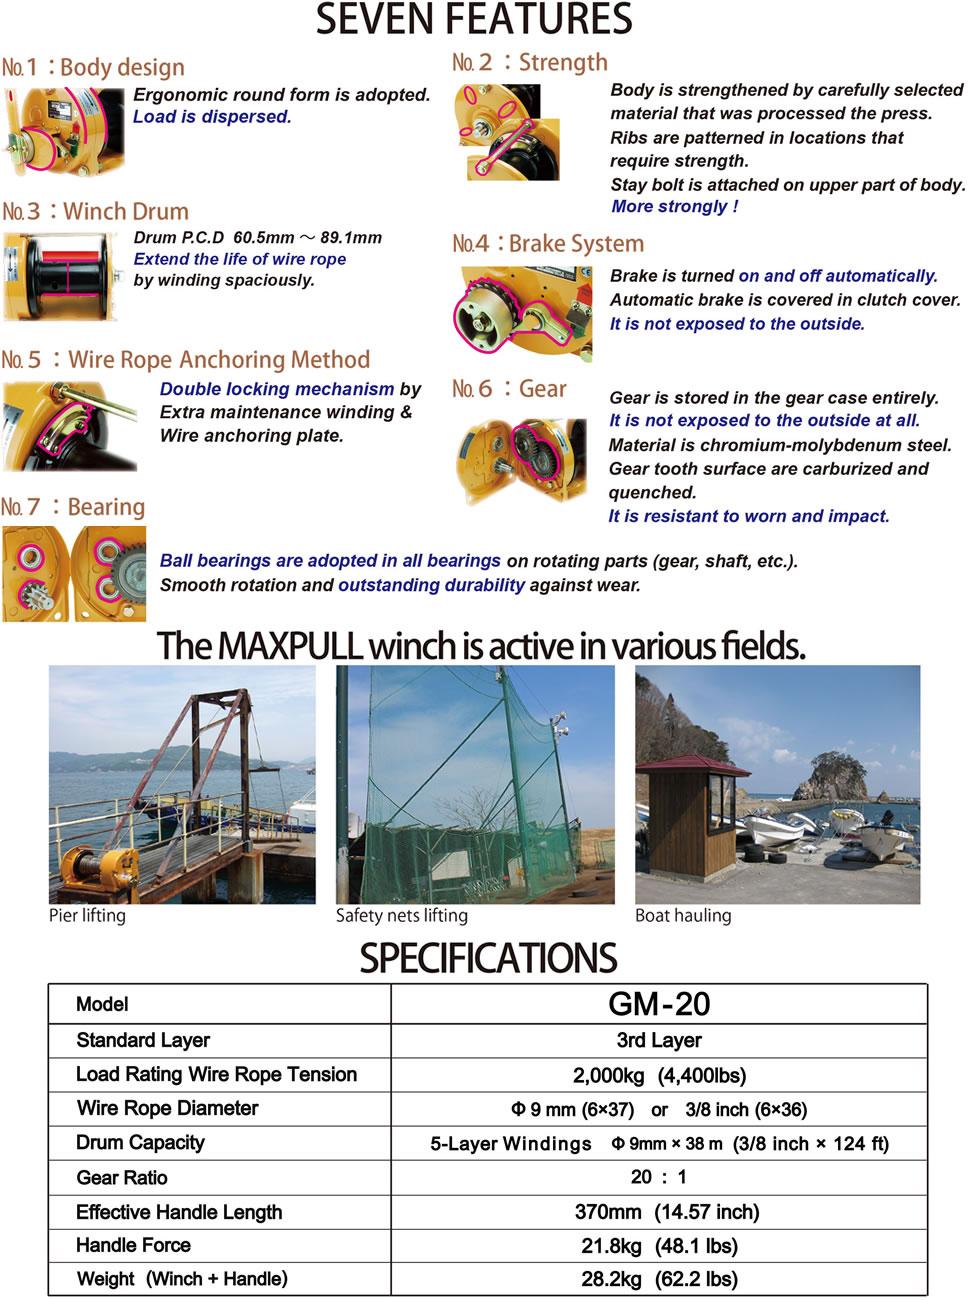 Amazon.com: Maxpull Steel Spur Gear Heavy Duty Hand Manual Winch ...